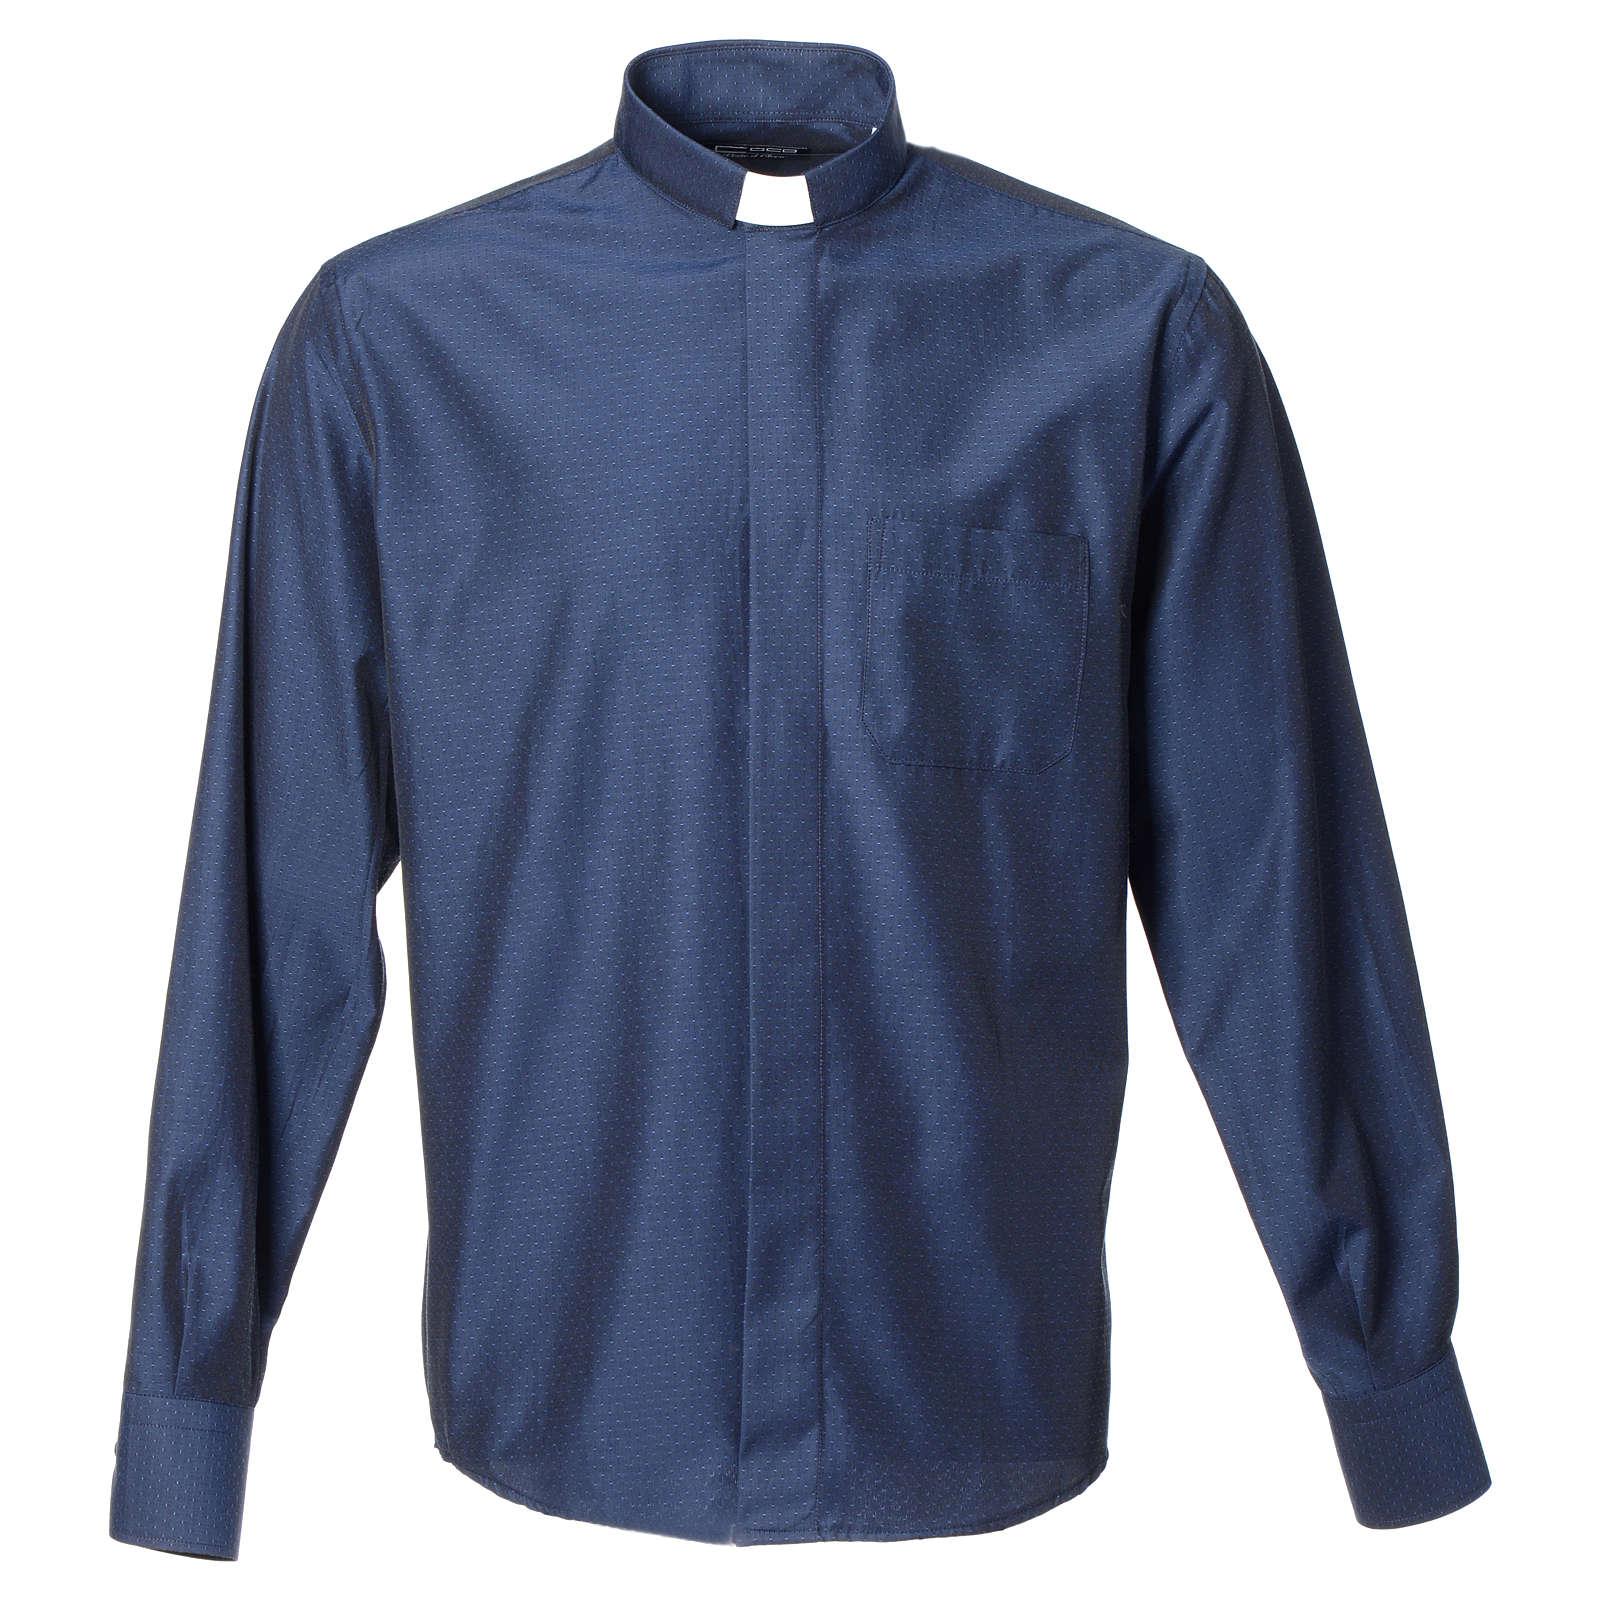 Camicia clergy cotone poliestere blu manica lunga 4